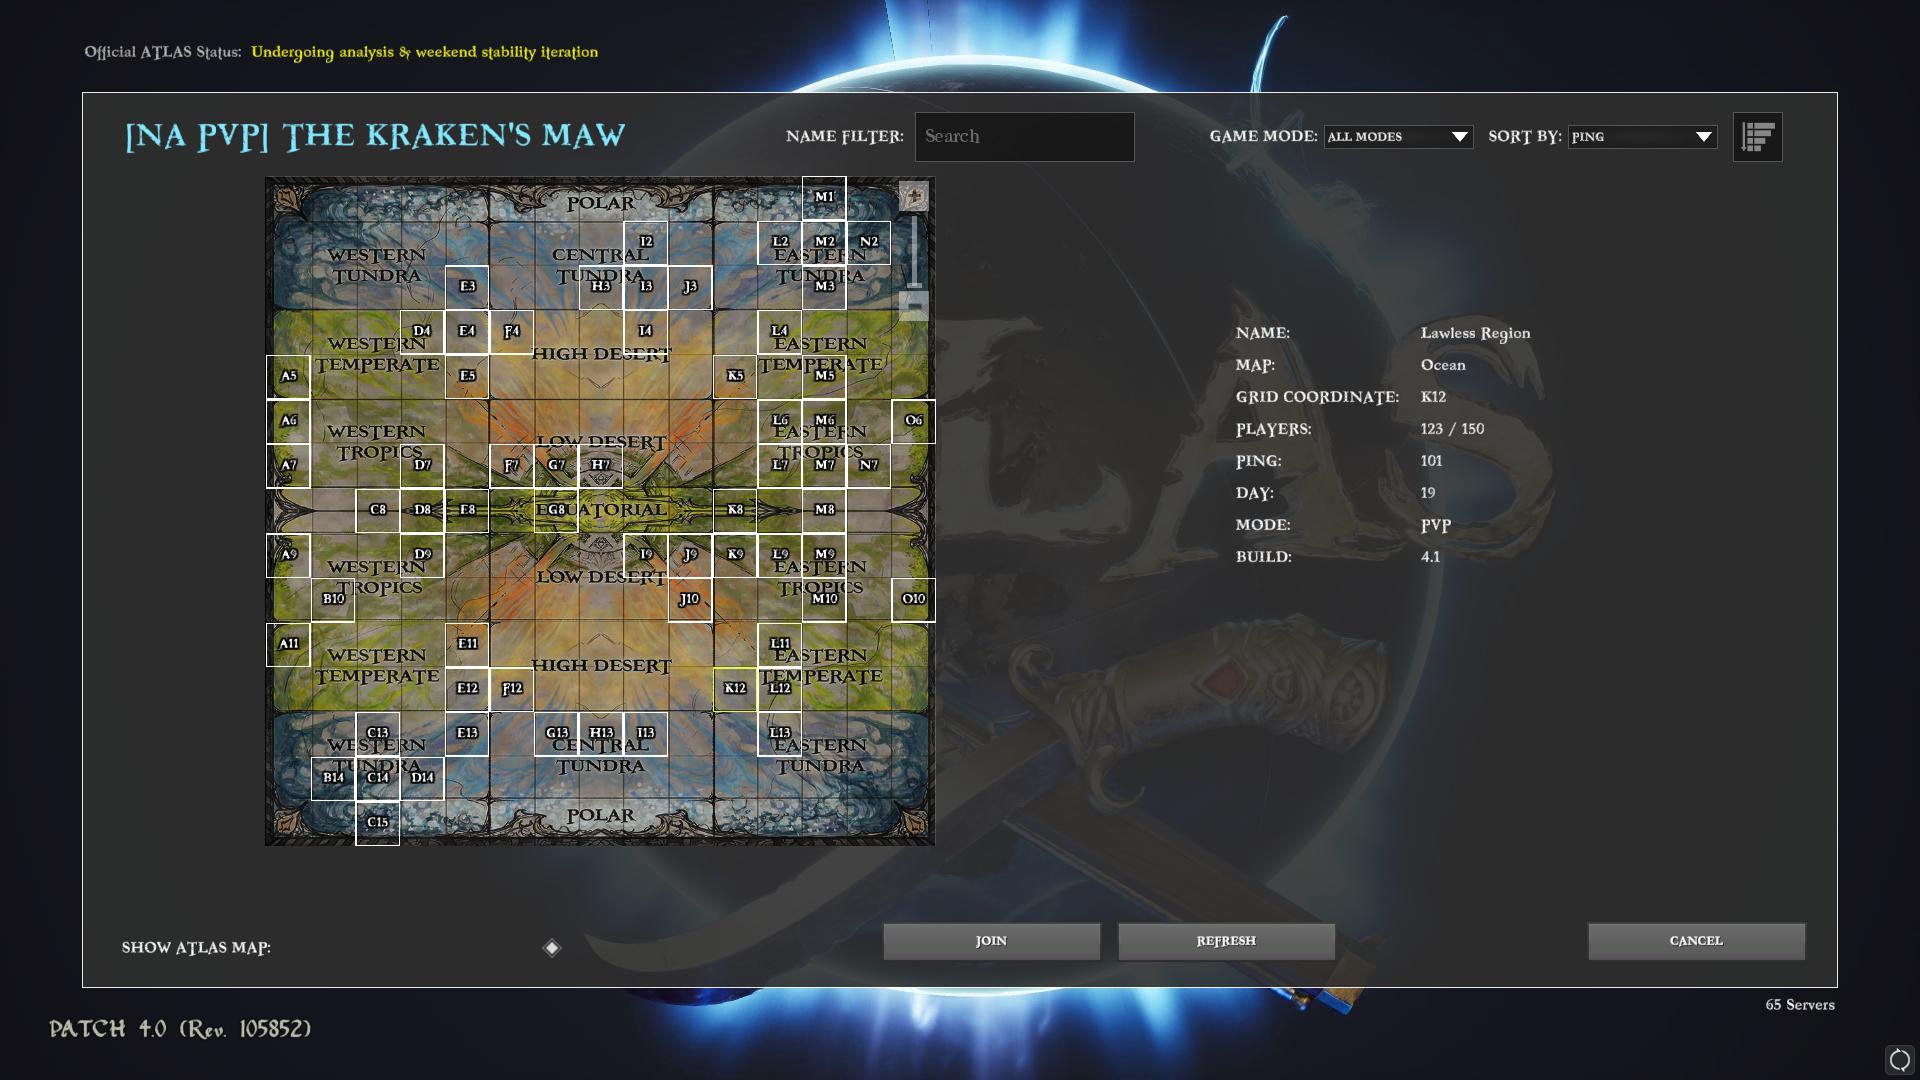 ATLAS - How to Properly Choose a Server as a Noob